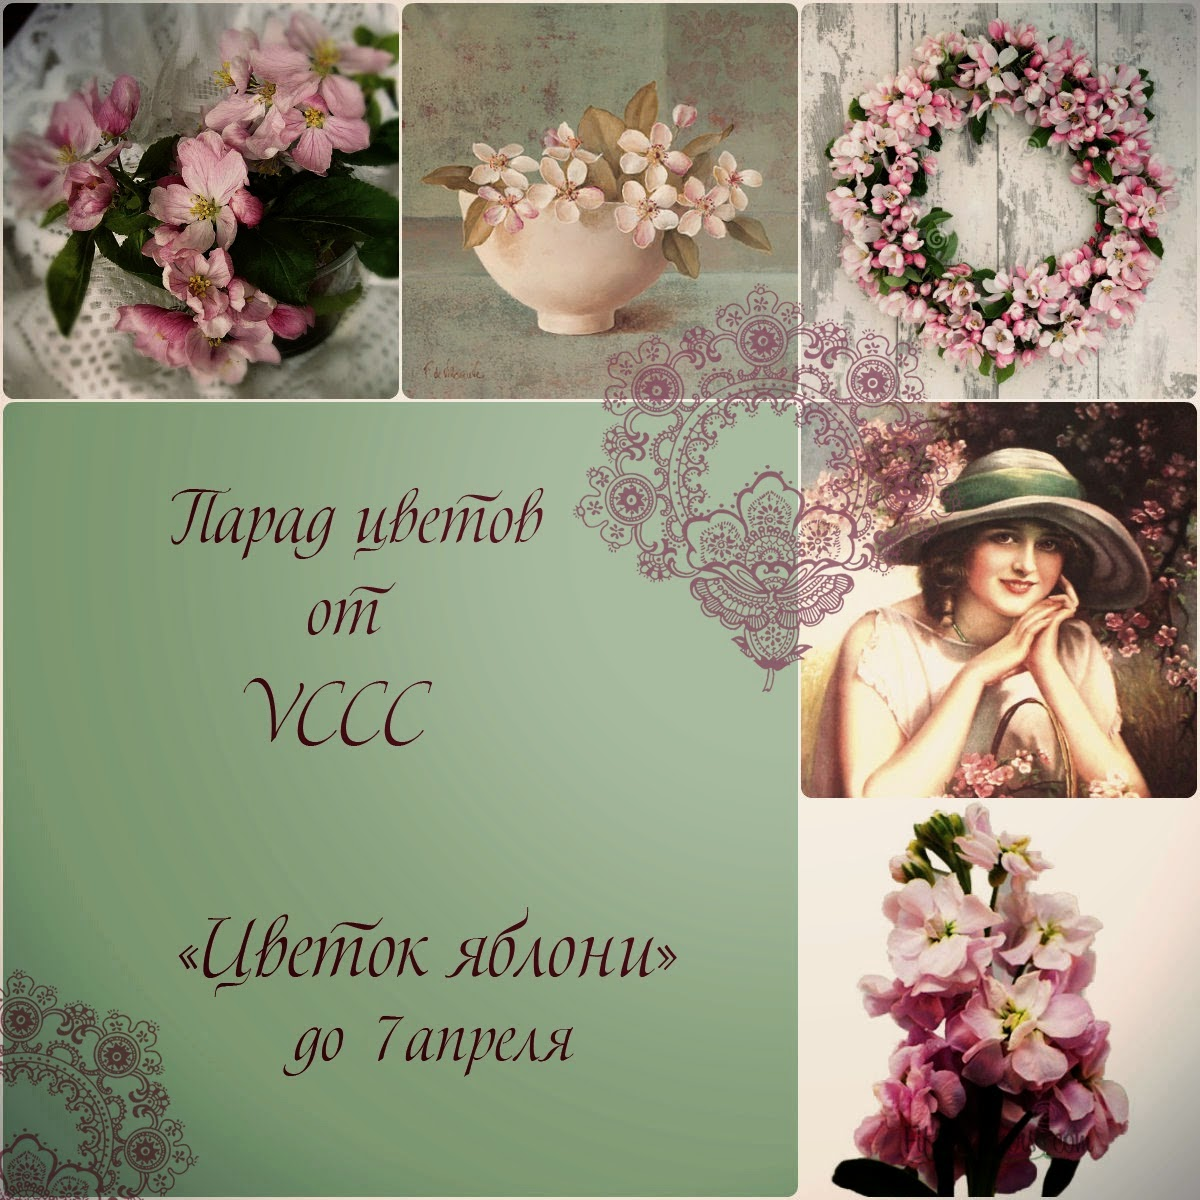 http://vintagecafecard.blogspot.ru/2014/03/blog-post_27.html